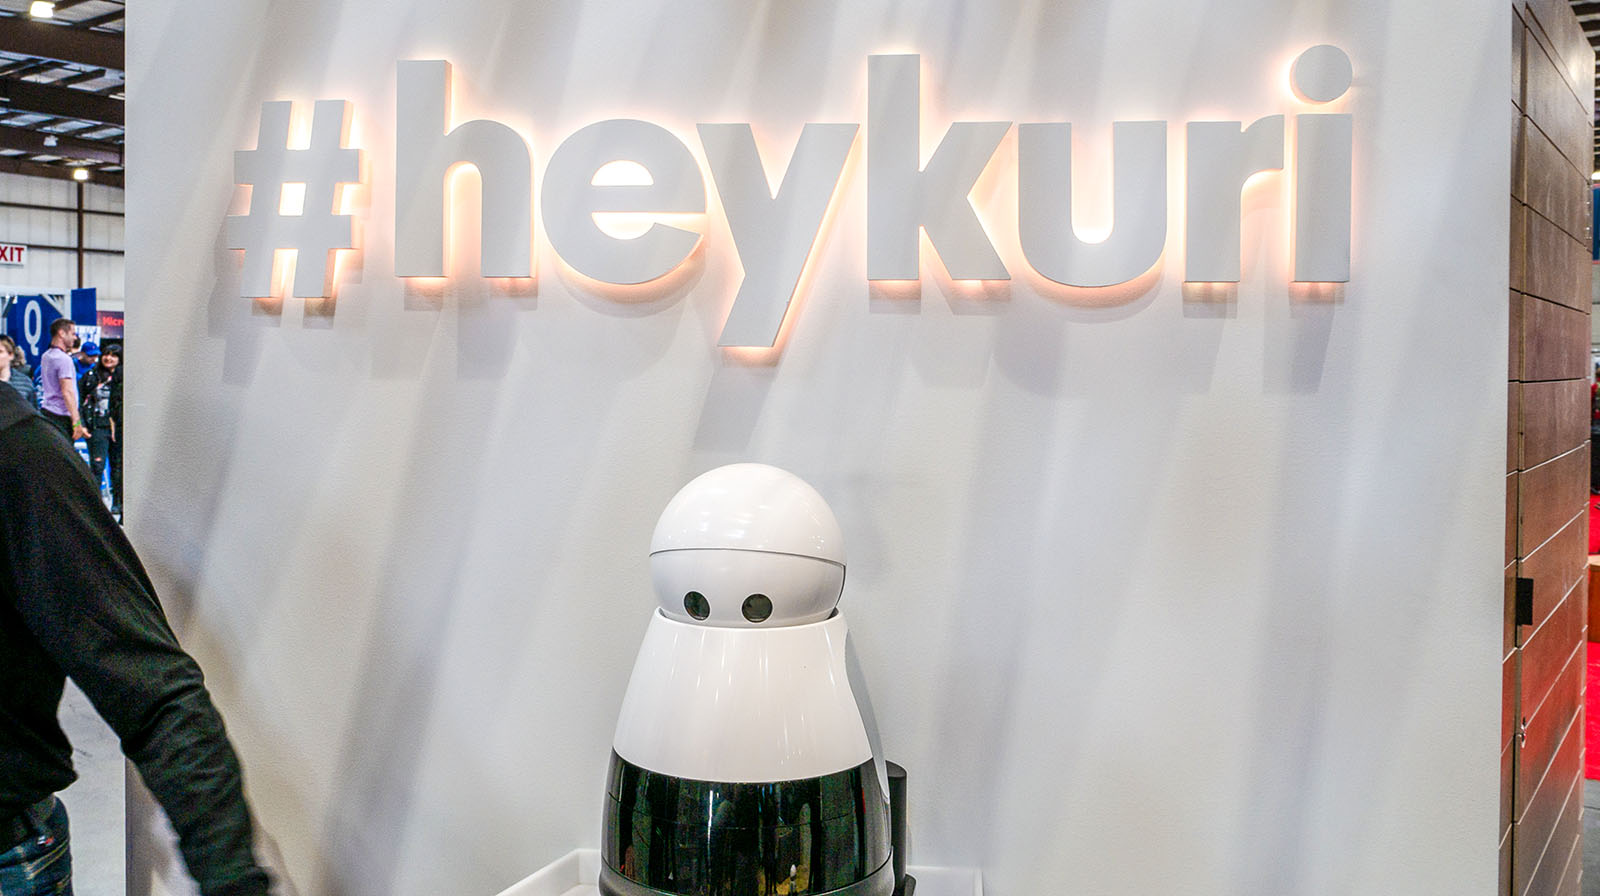 Hey Kuri Personal Robot